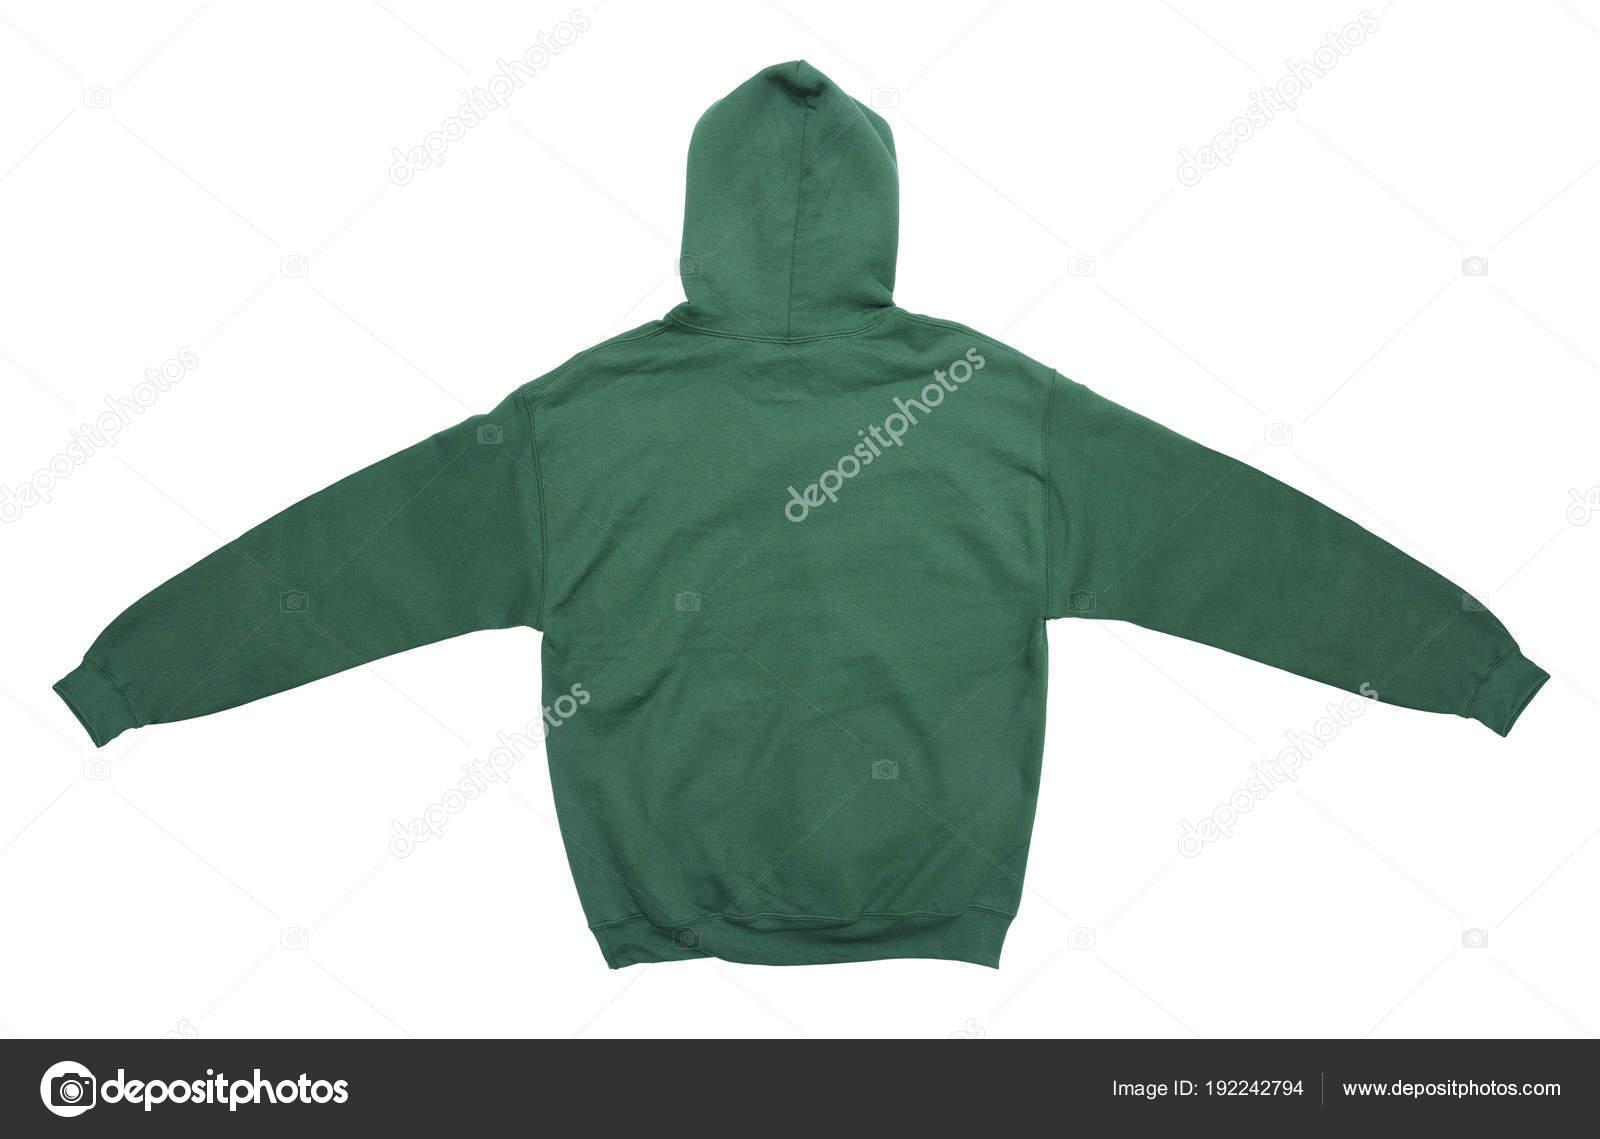 2e5374692076 Απλώνονται Κενό Hoodie Φούτερ Πίσω Θέα Πράσινο Χρώμα Άσπρο Φόντο ...